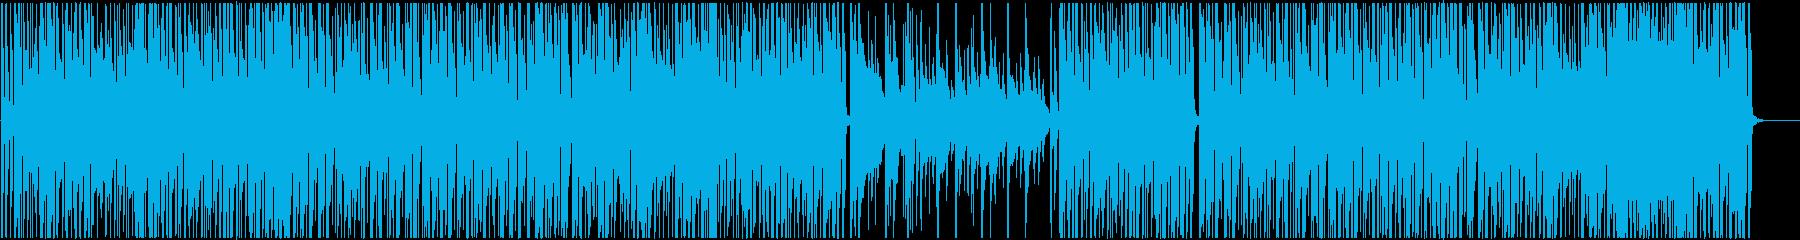 STEM -ブラスとギター抜きバージョンの再生済みの波形